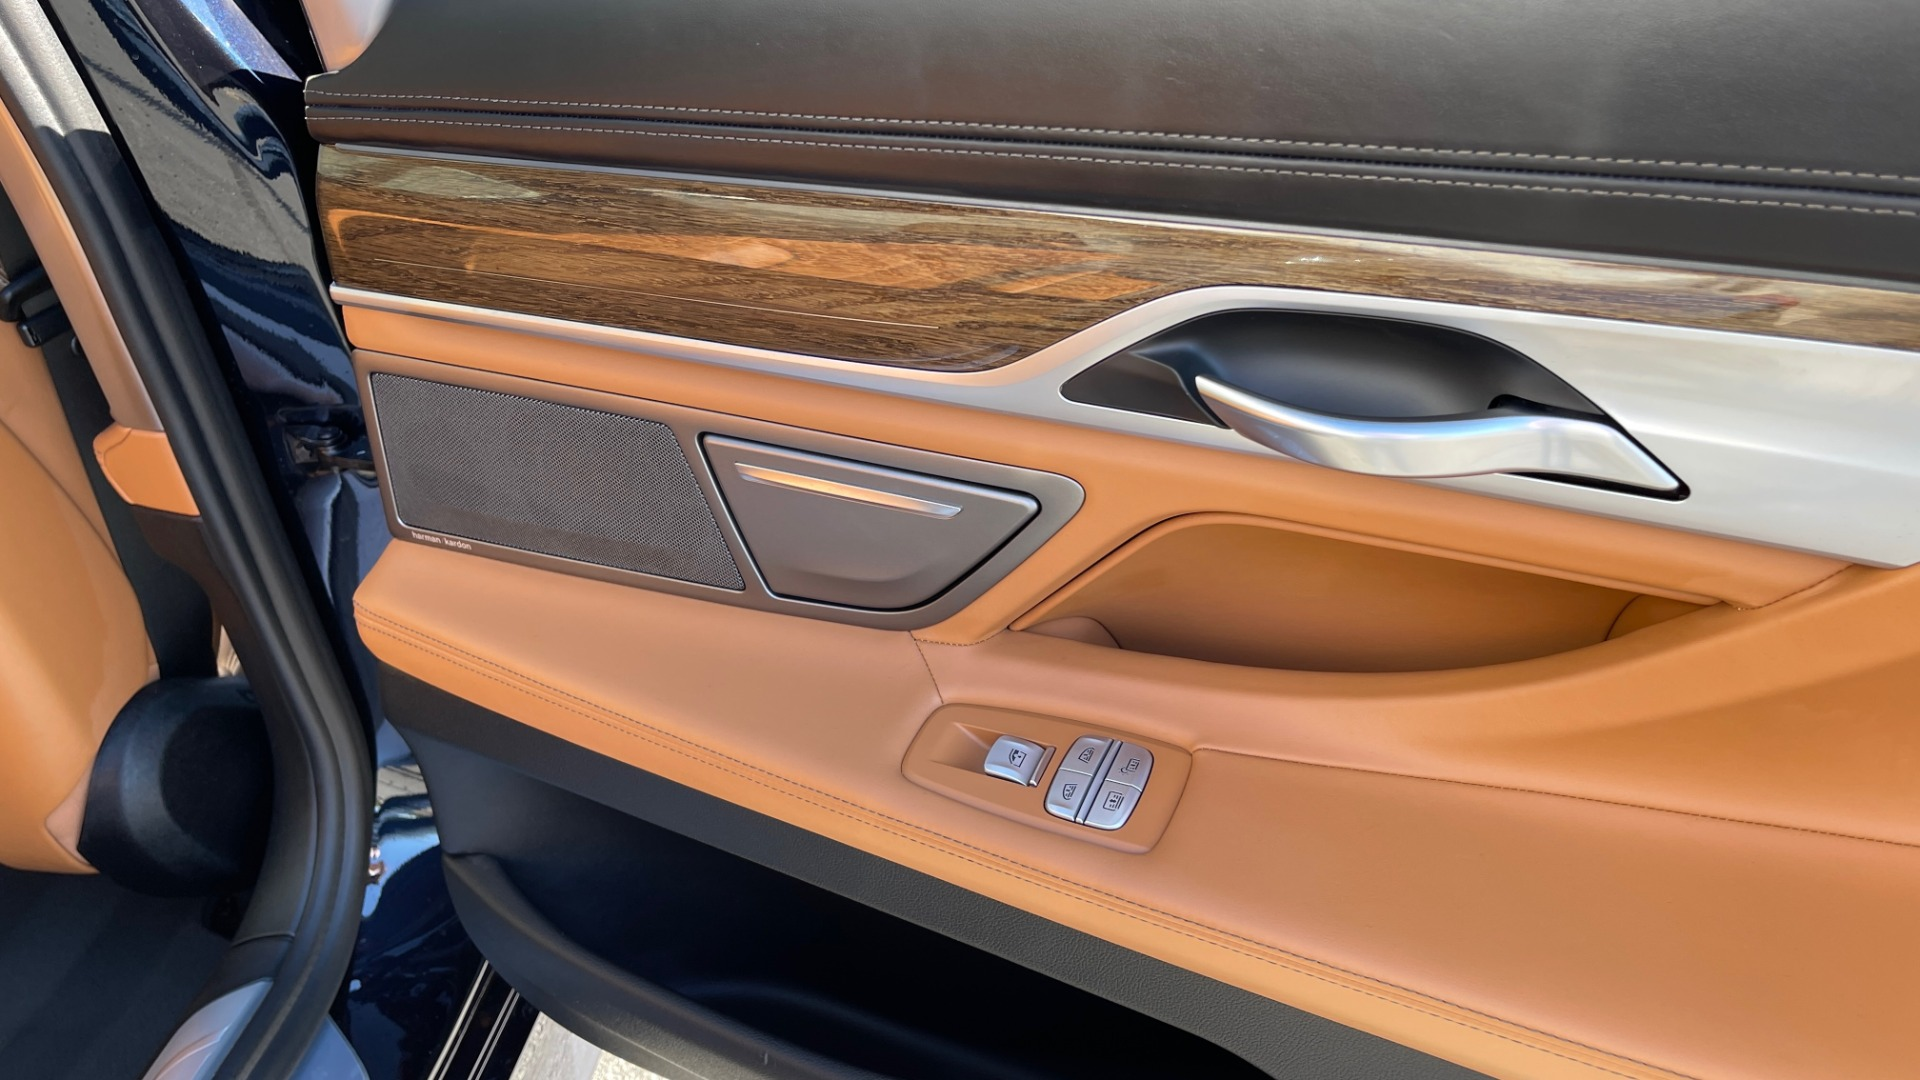 Used 2019 BMW 7 SERIES 750I XDRIVE M-SPORT / EXEC PKG / DRVR ASST PLUS / CLD WTHR / PAR for sale $60,995 at Formula Imports in Charlotte NC 28227 50